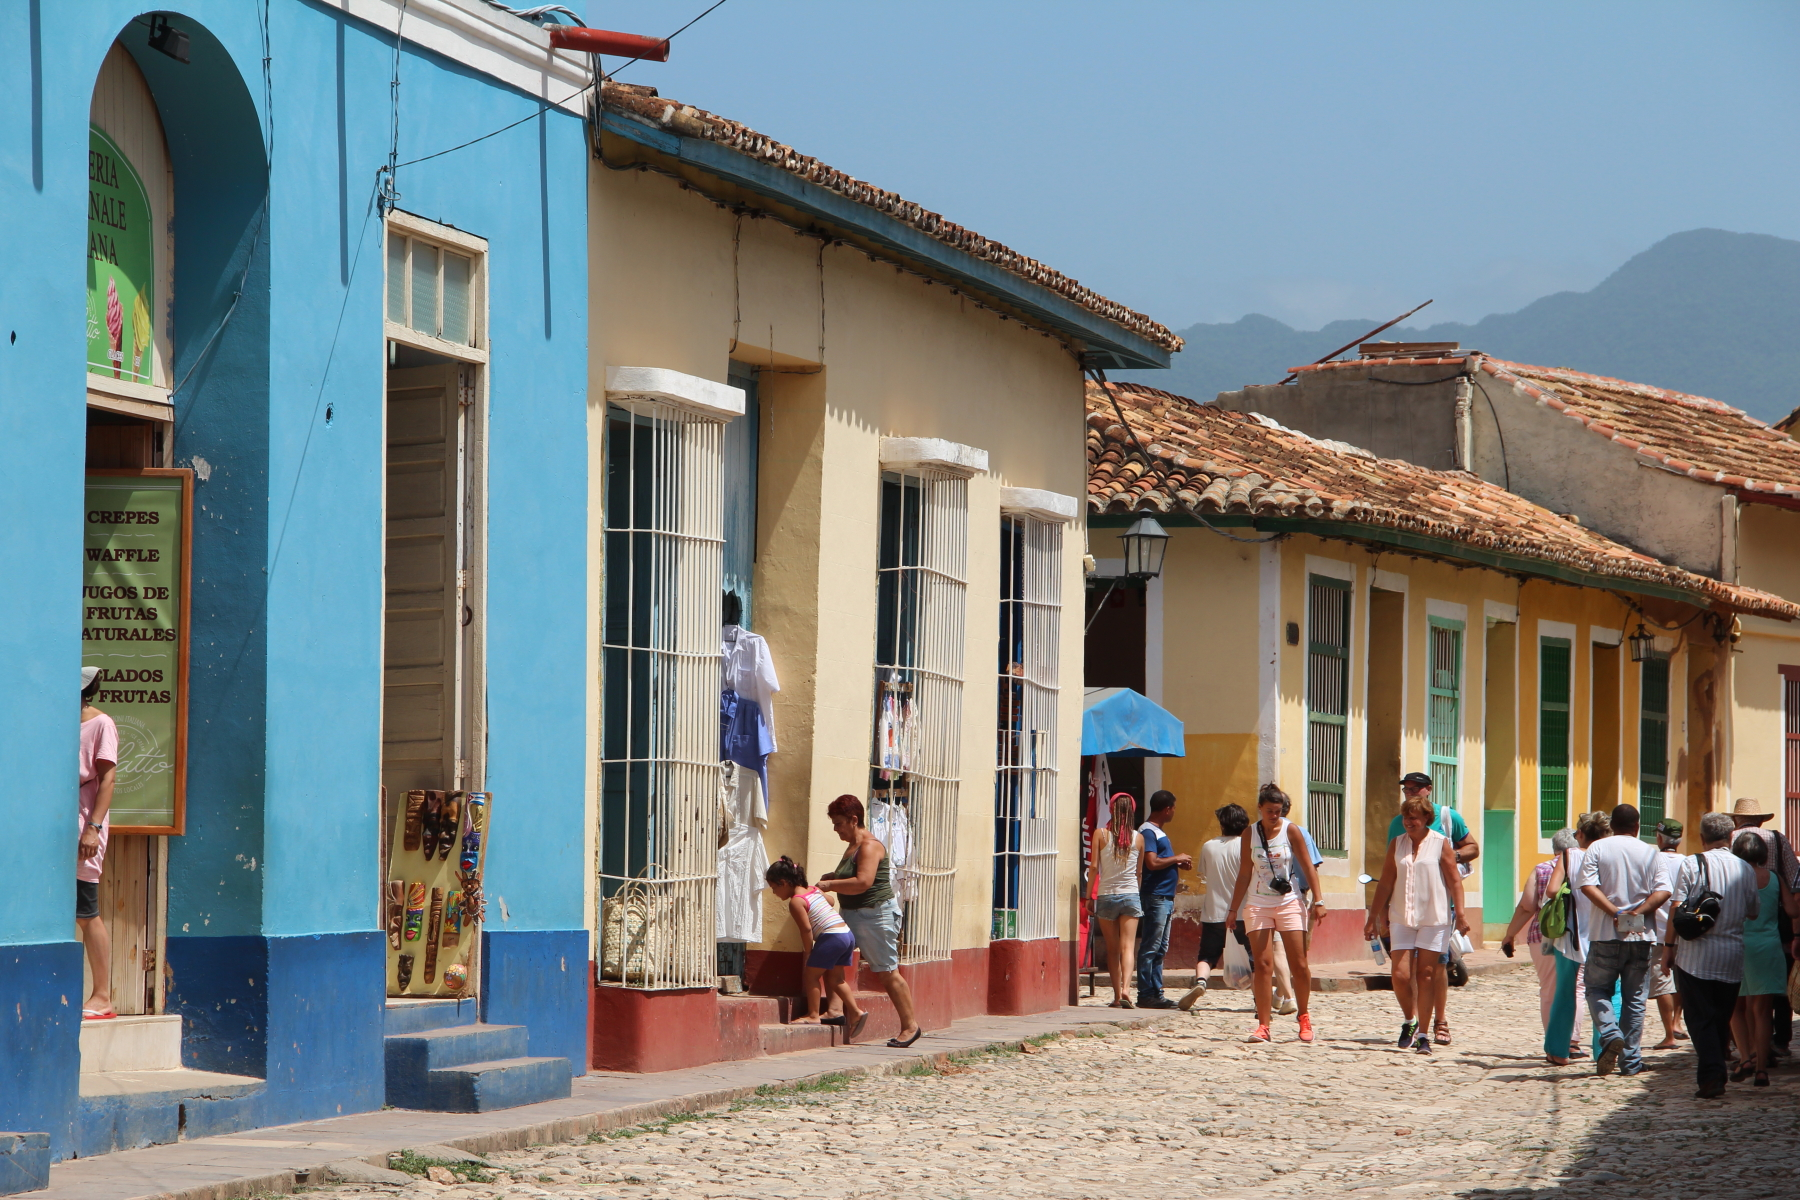 Havanna habana libre im letzten stockwerk - 3 part 9